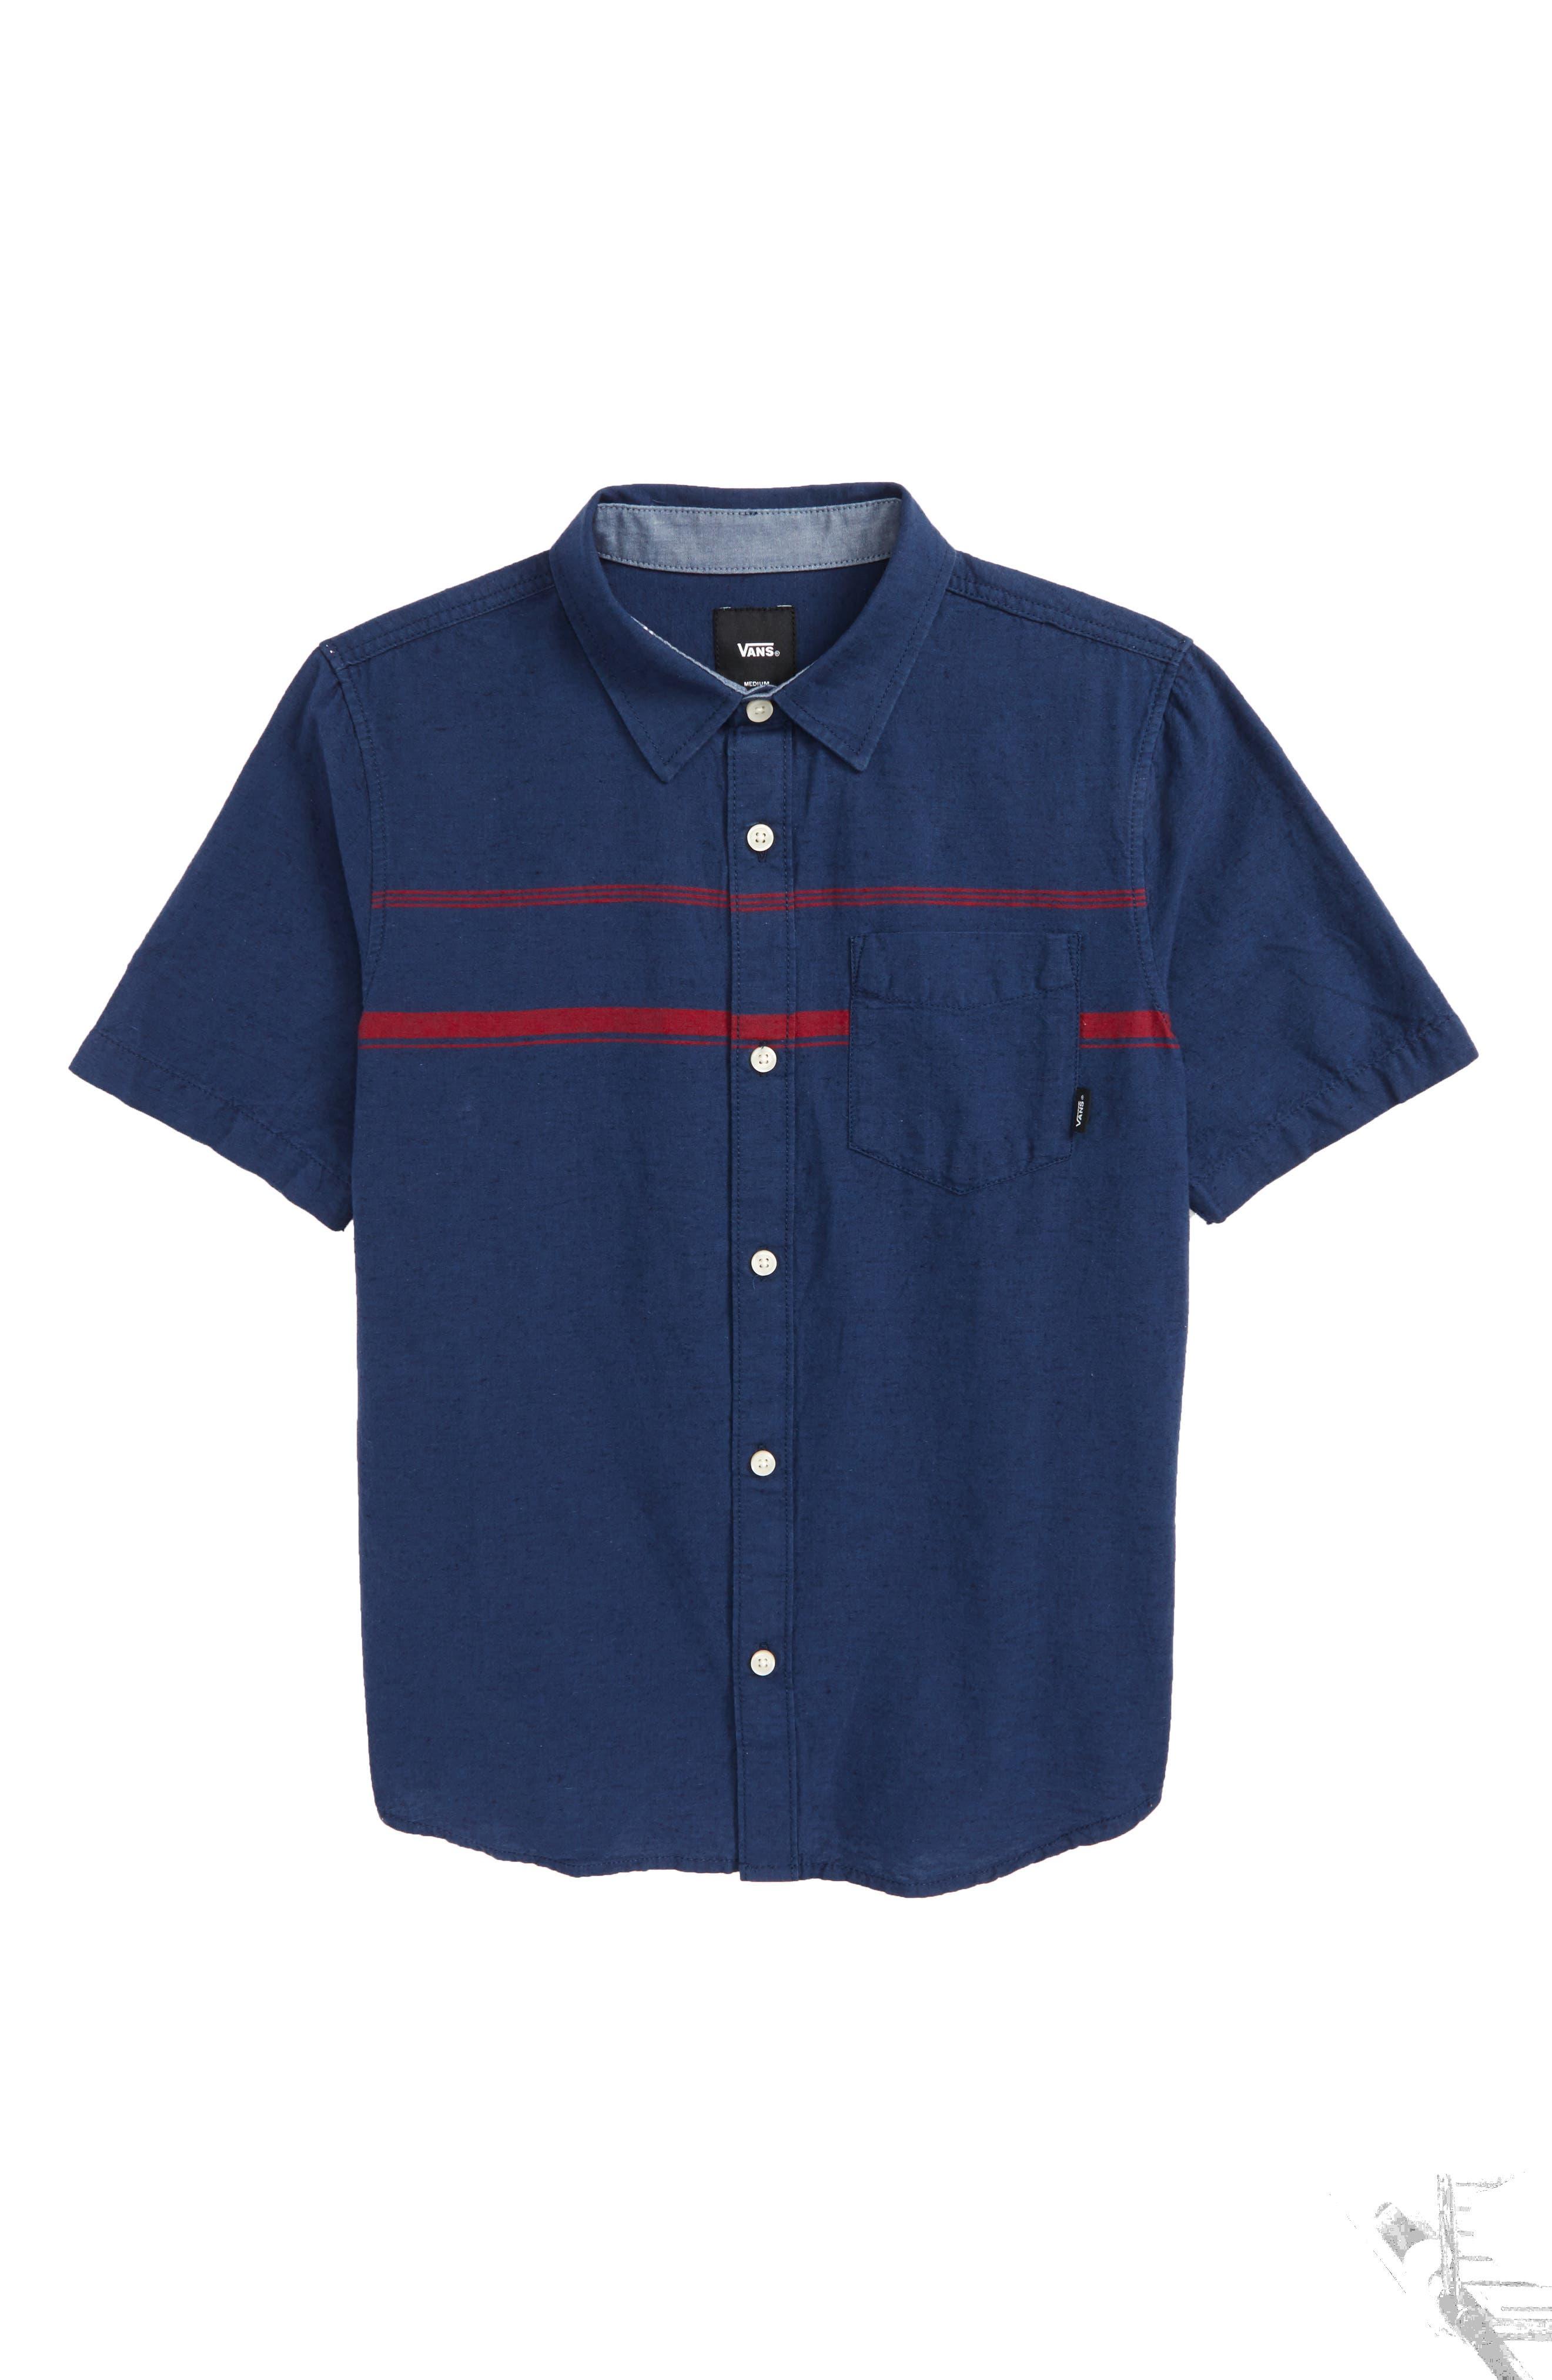 Thurber Boys Woven Shirt,                             Main thumbnail 1, color,                             401